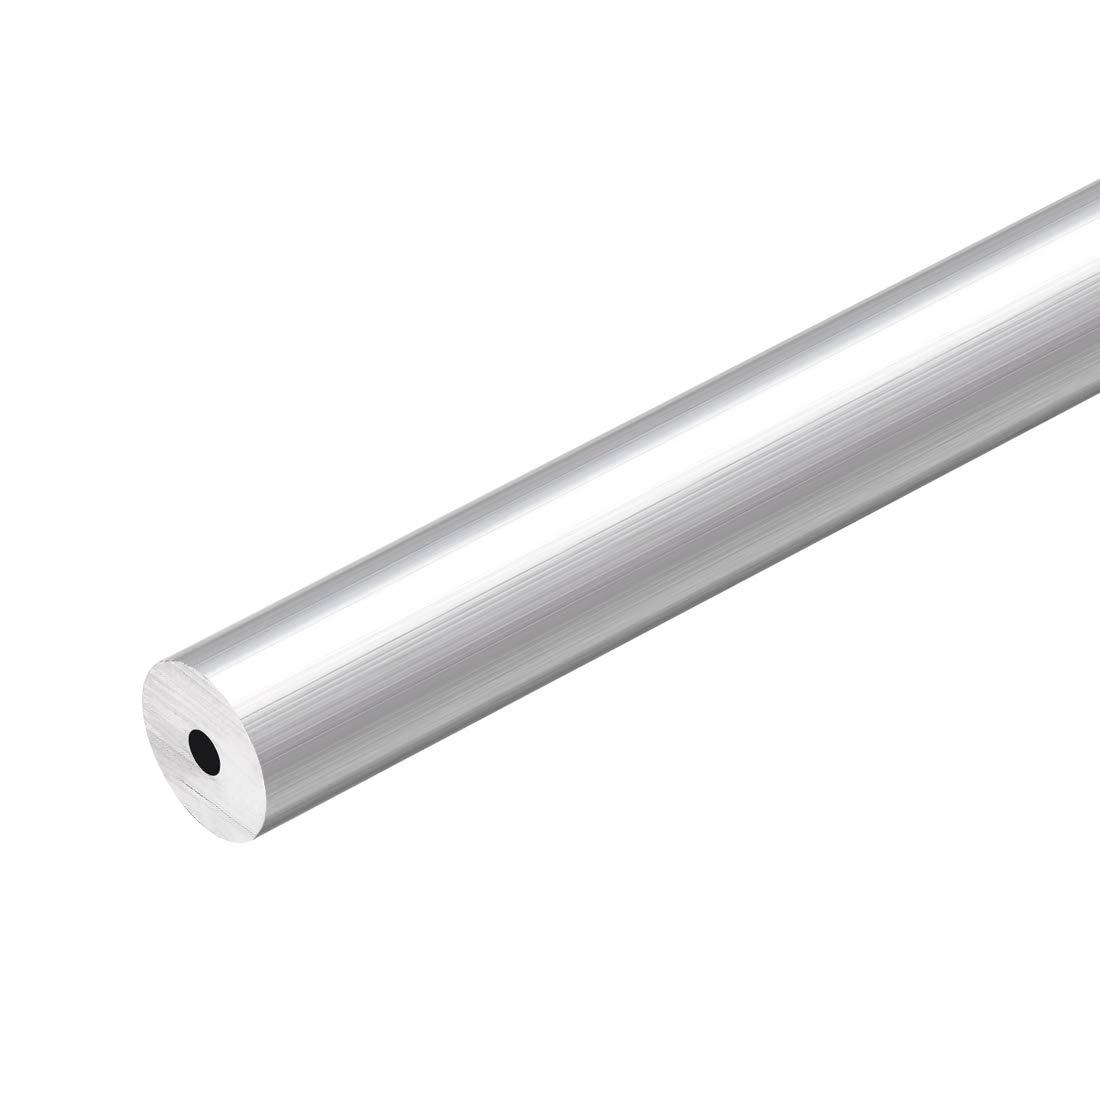 uxcell 6063 Aluminum Round Tube, 300mm Length 12mm OD 3mm Inner Dia Seamless Aluminum Straight Tubing